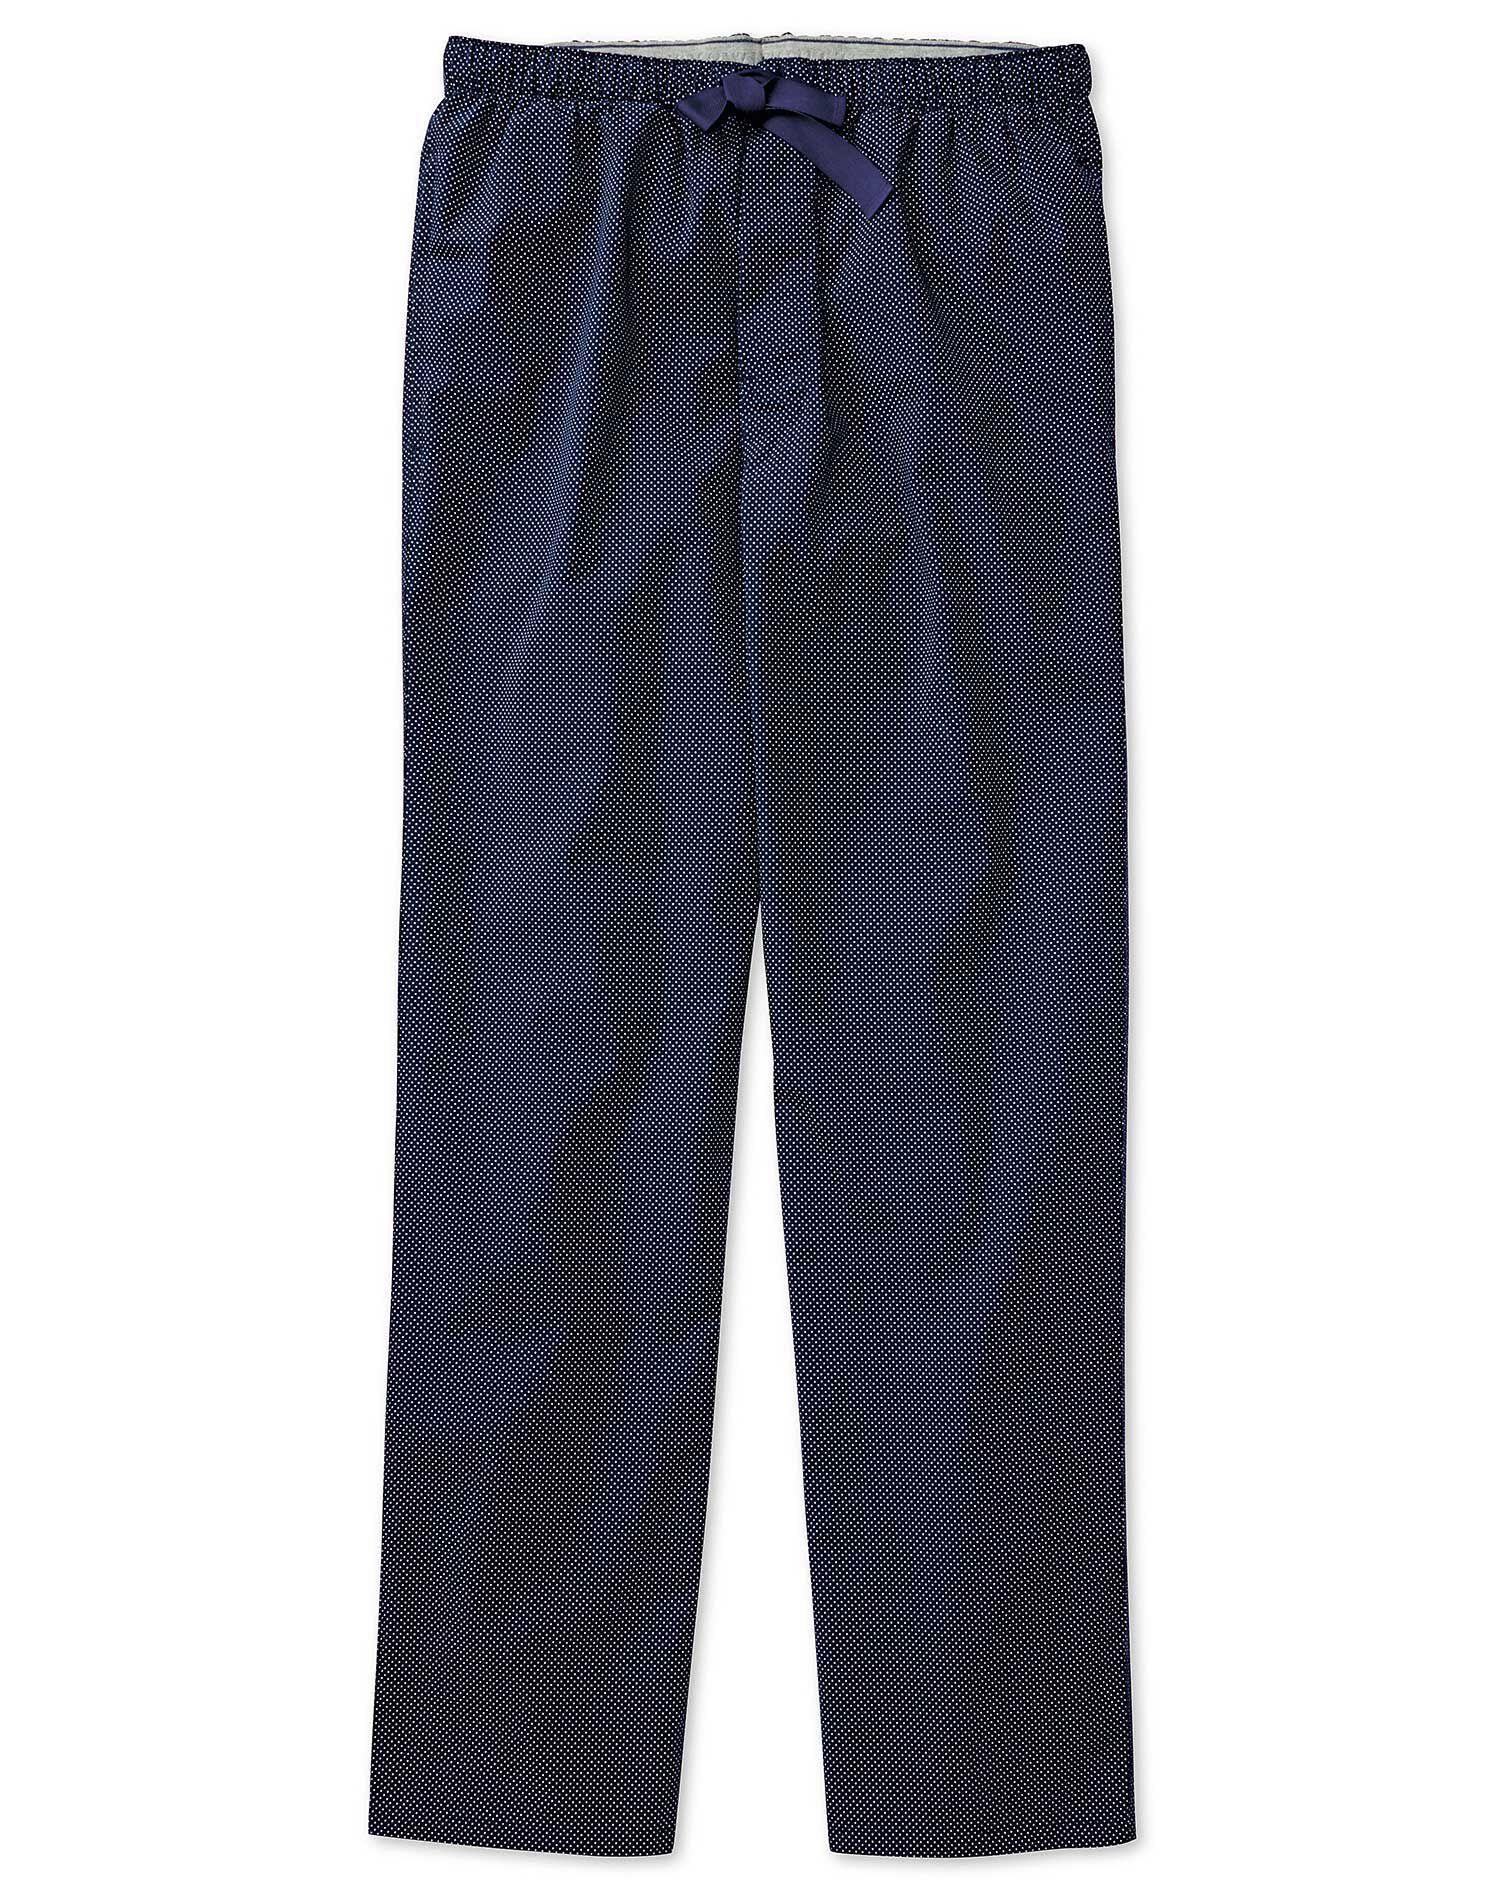 Navy Dot Brushed Cotton Pyjama Trousers Size Medium by Charles Tyrwhitt